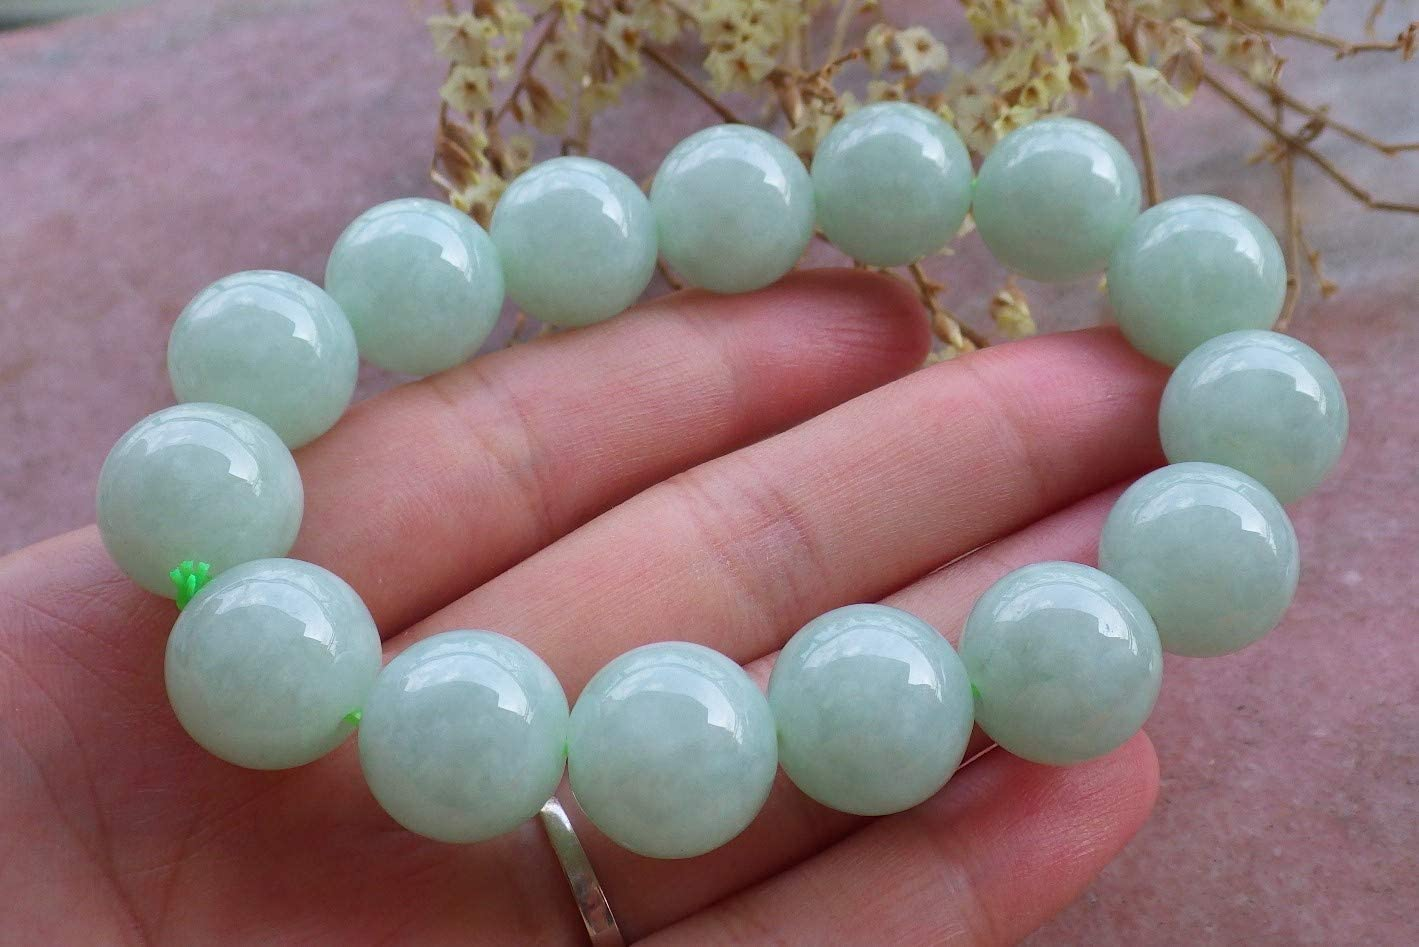 gojade Certified Green 100% Natural A Jade Jadeite Bead Beads Bangle Bracelet (Bead: 13 mm Approx) 翡翠手链 728769